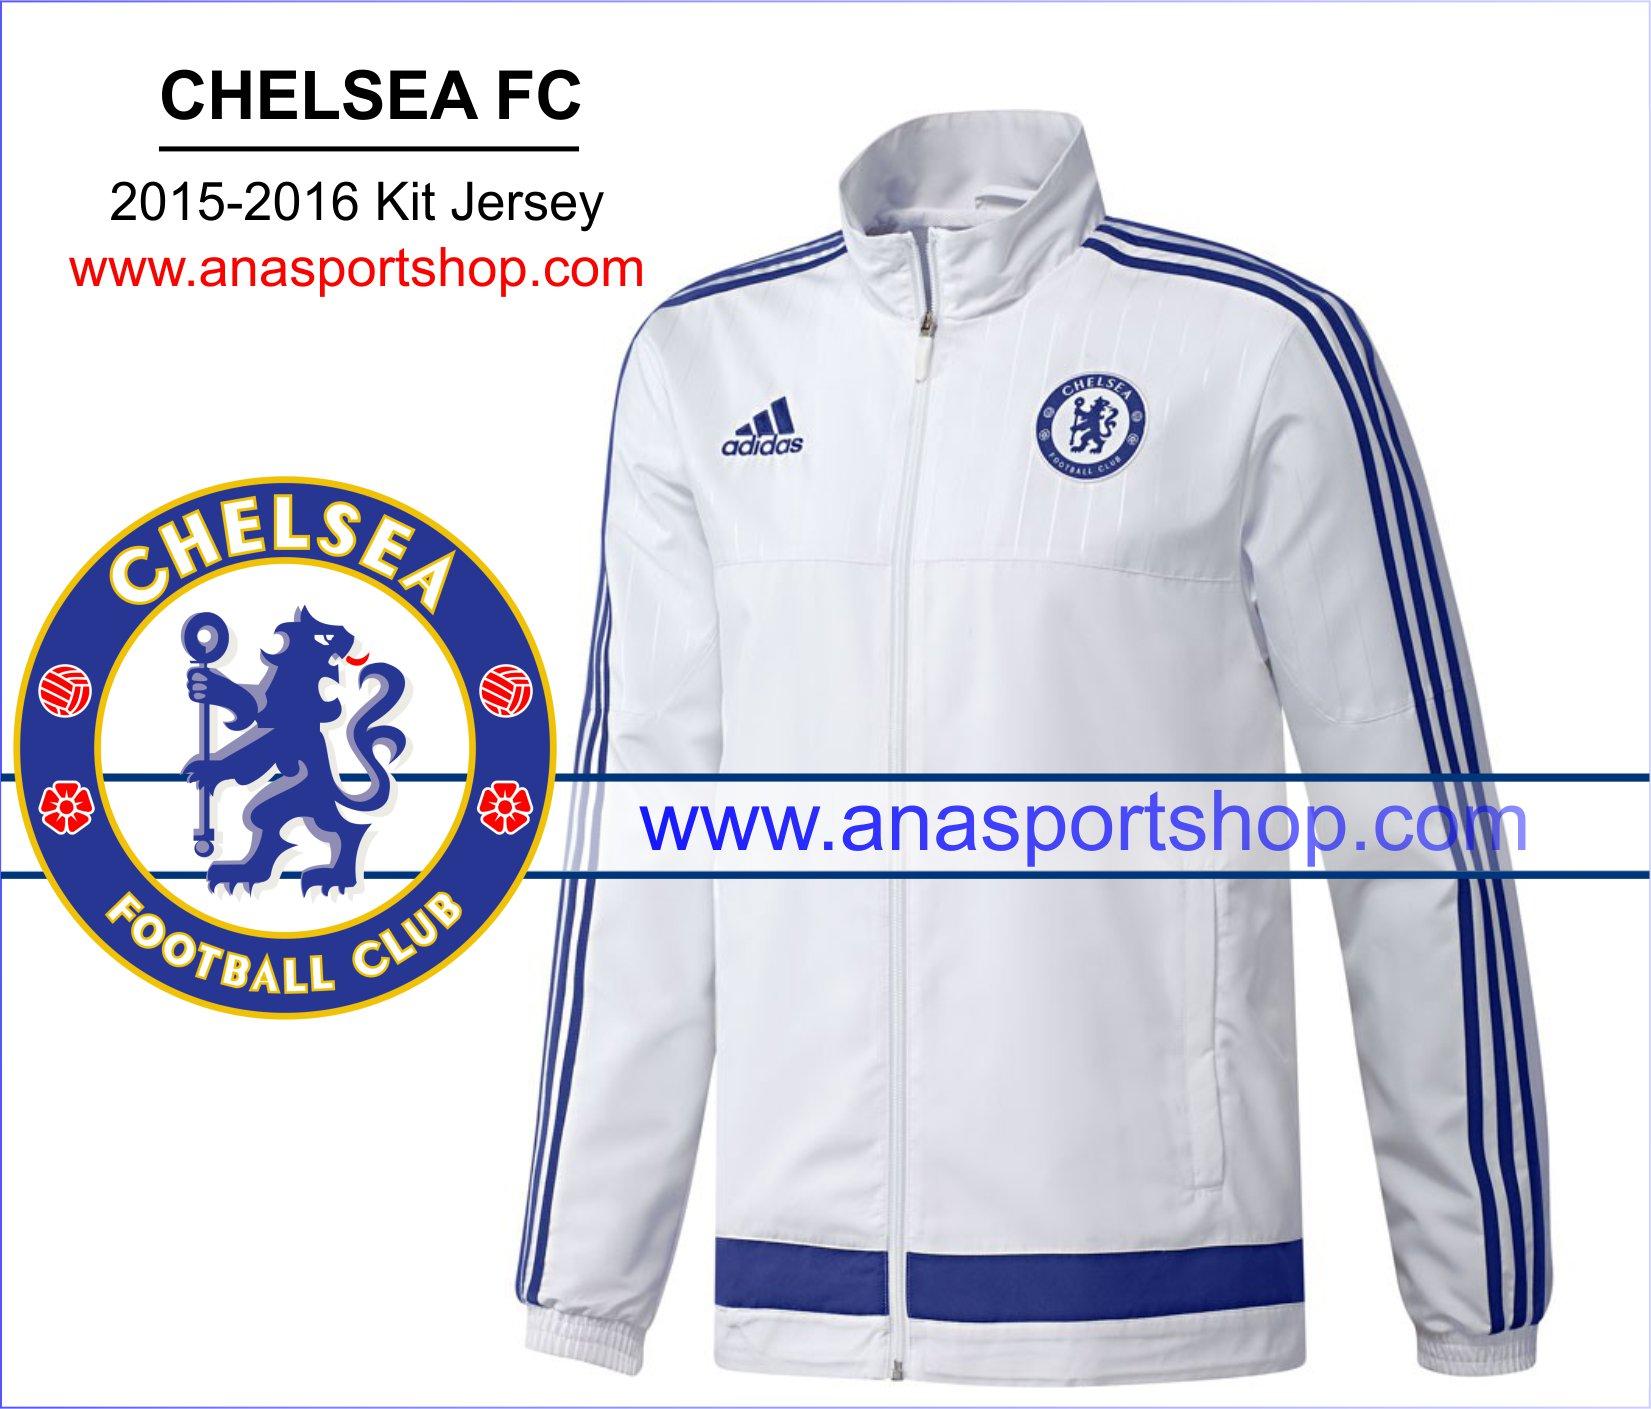 Áo khoác nỉ Chelsea 2015-2016